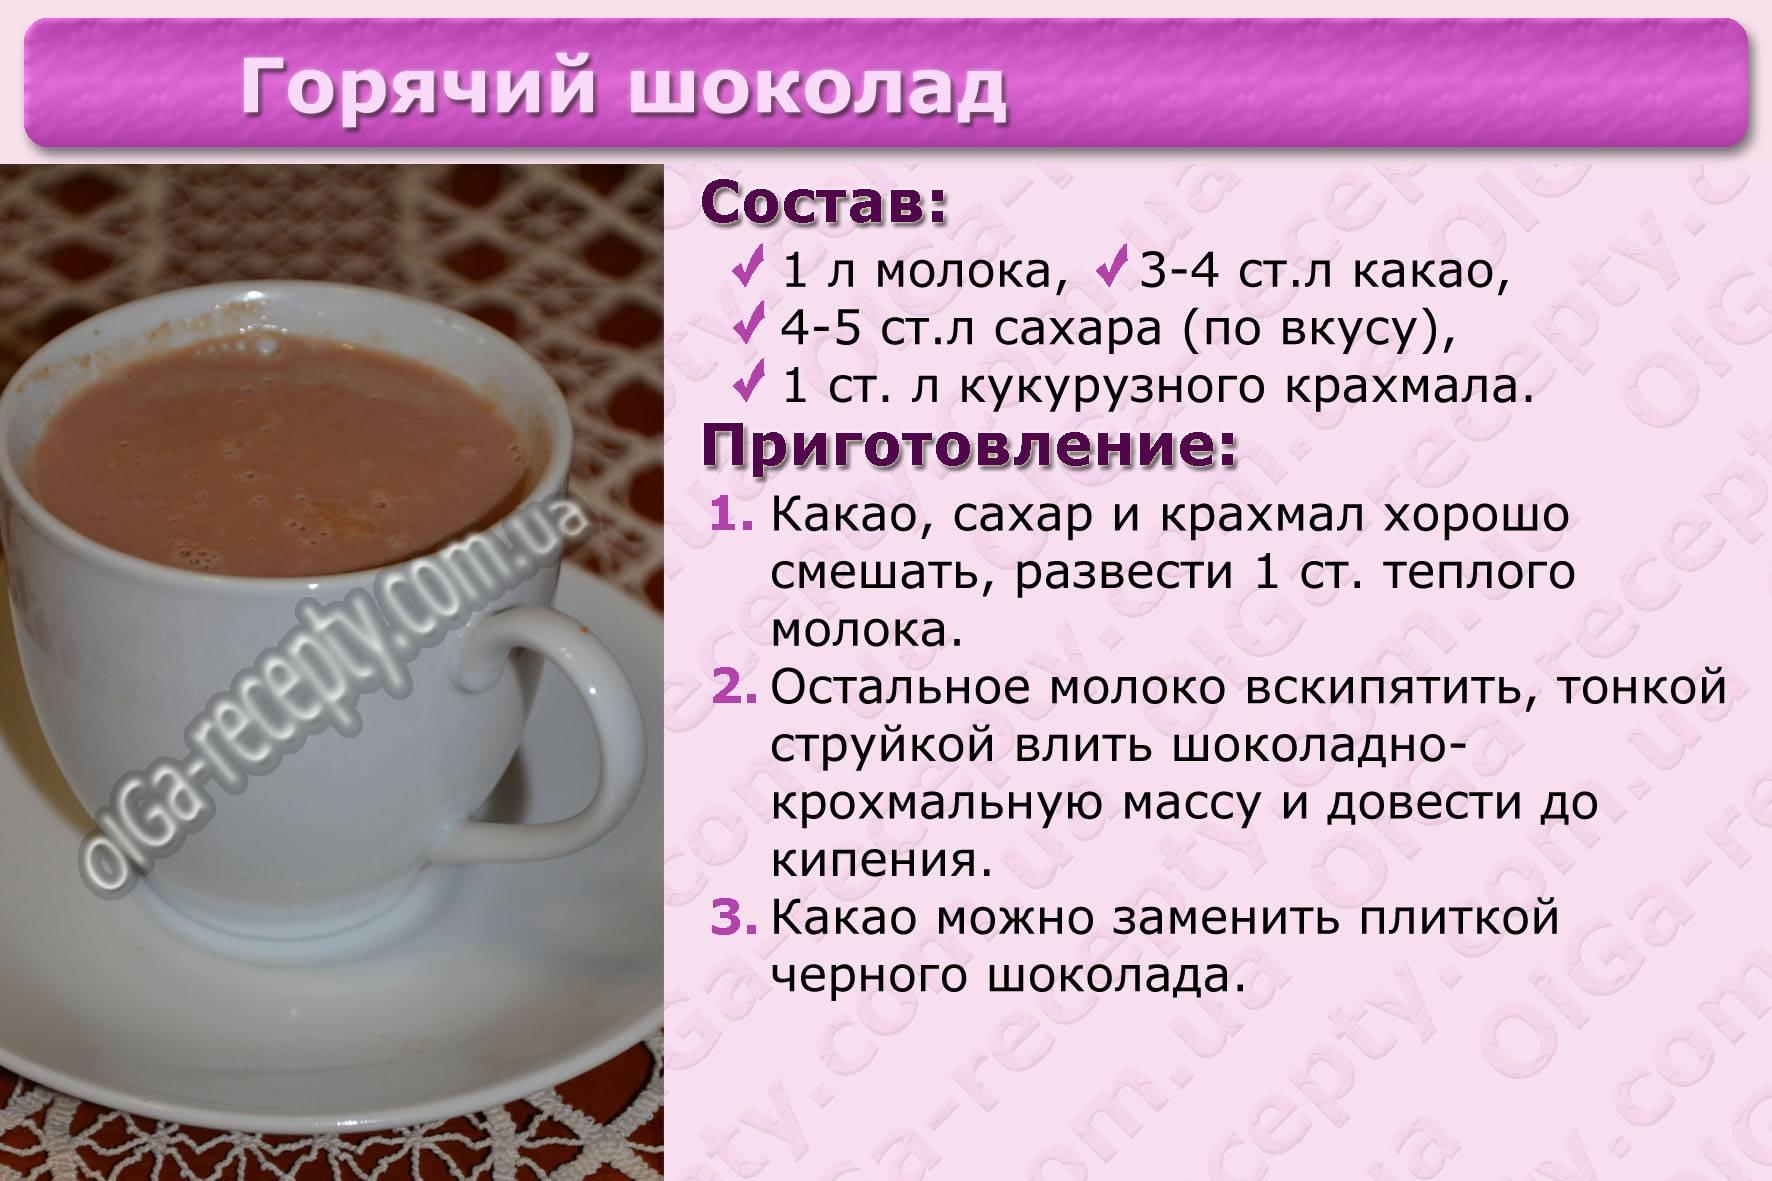 Как сварить какао из какао порошка — 7 рецептов (на молоке и воде)